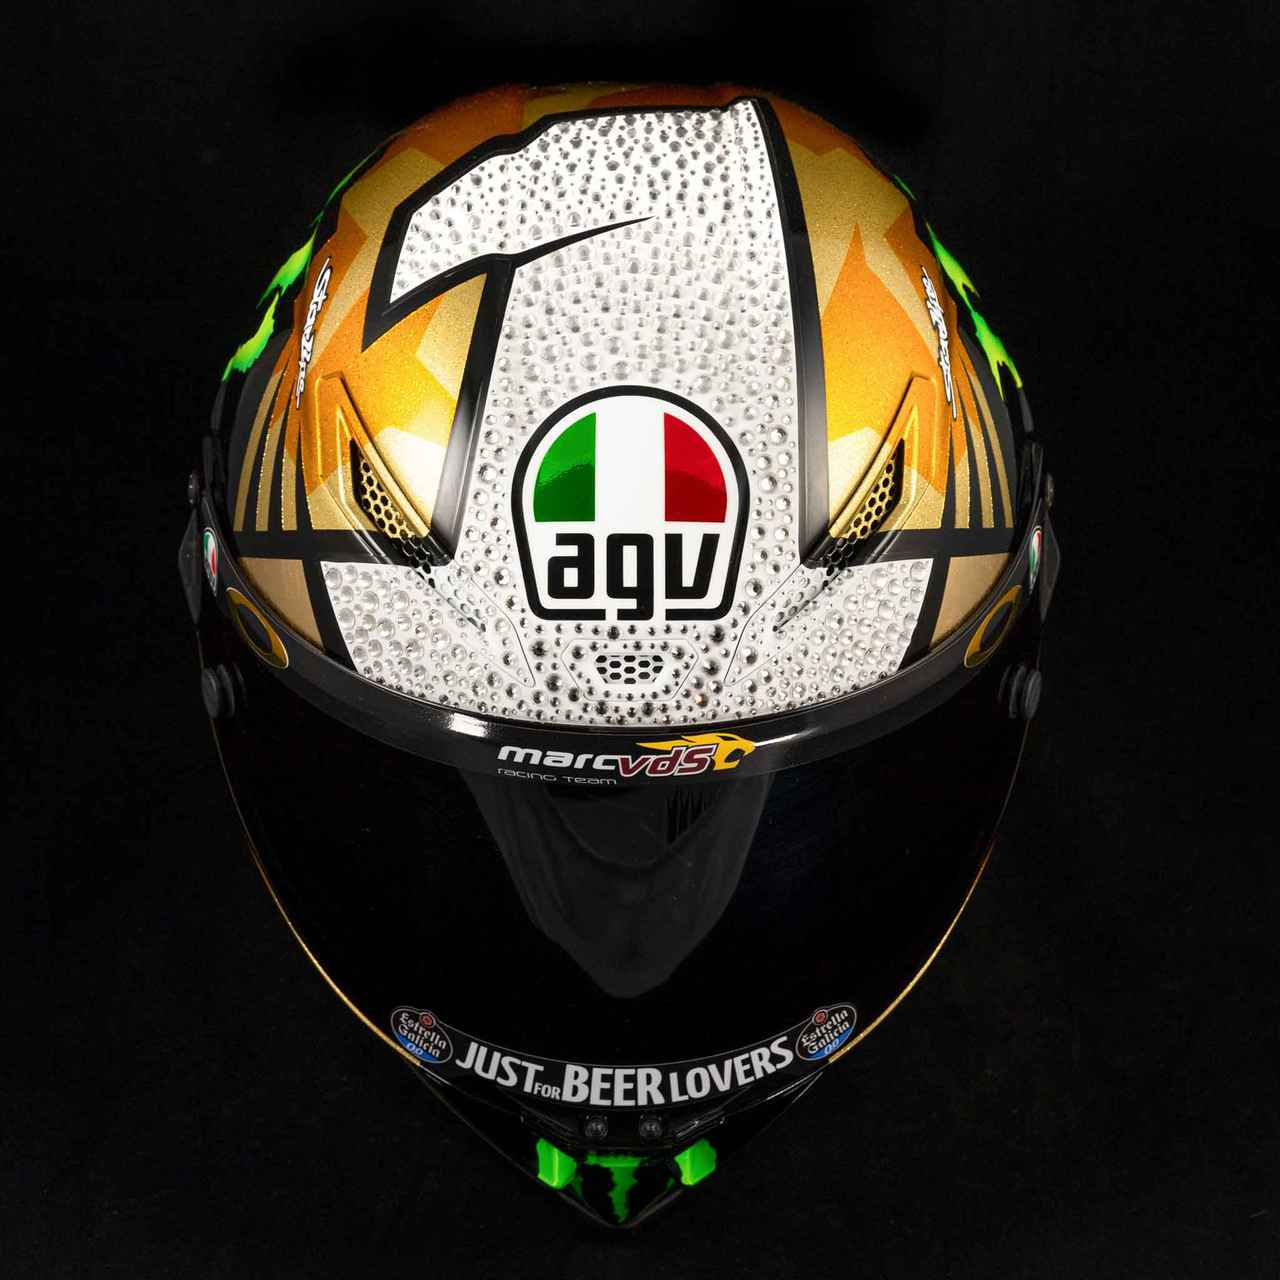 Images : 1番目の画像 - AGV PISTA GP RR 012-MIR WORLD CHAMPION 2020 - webオートバイ